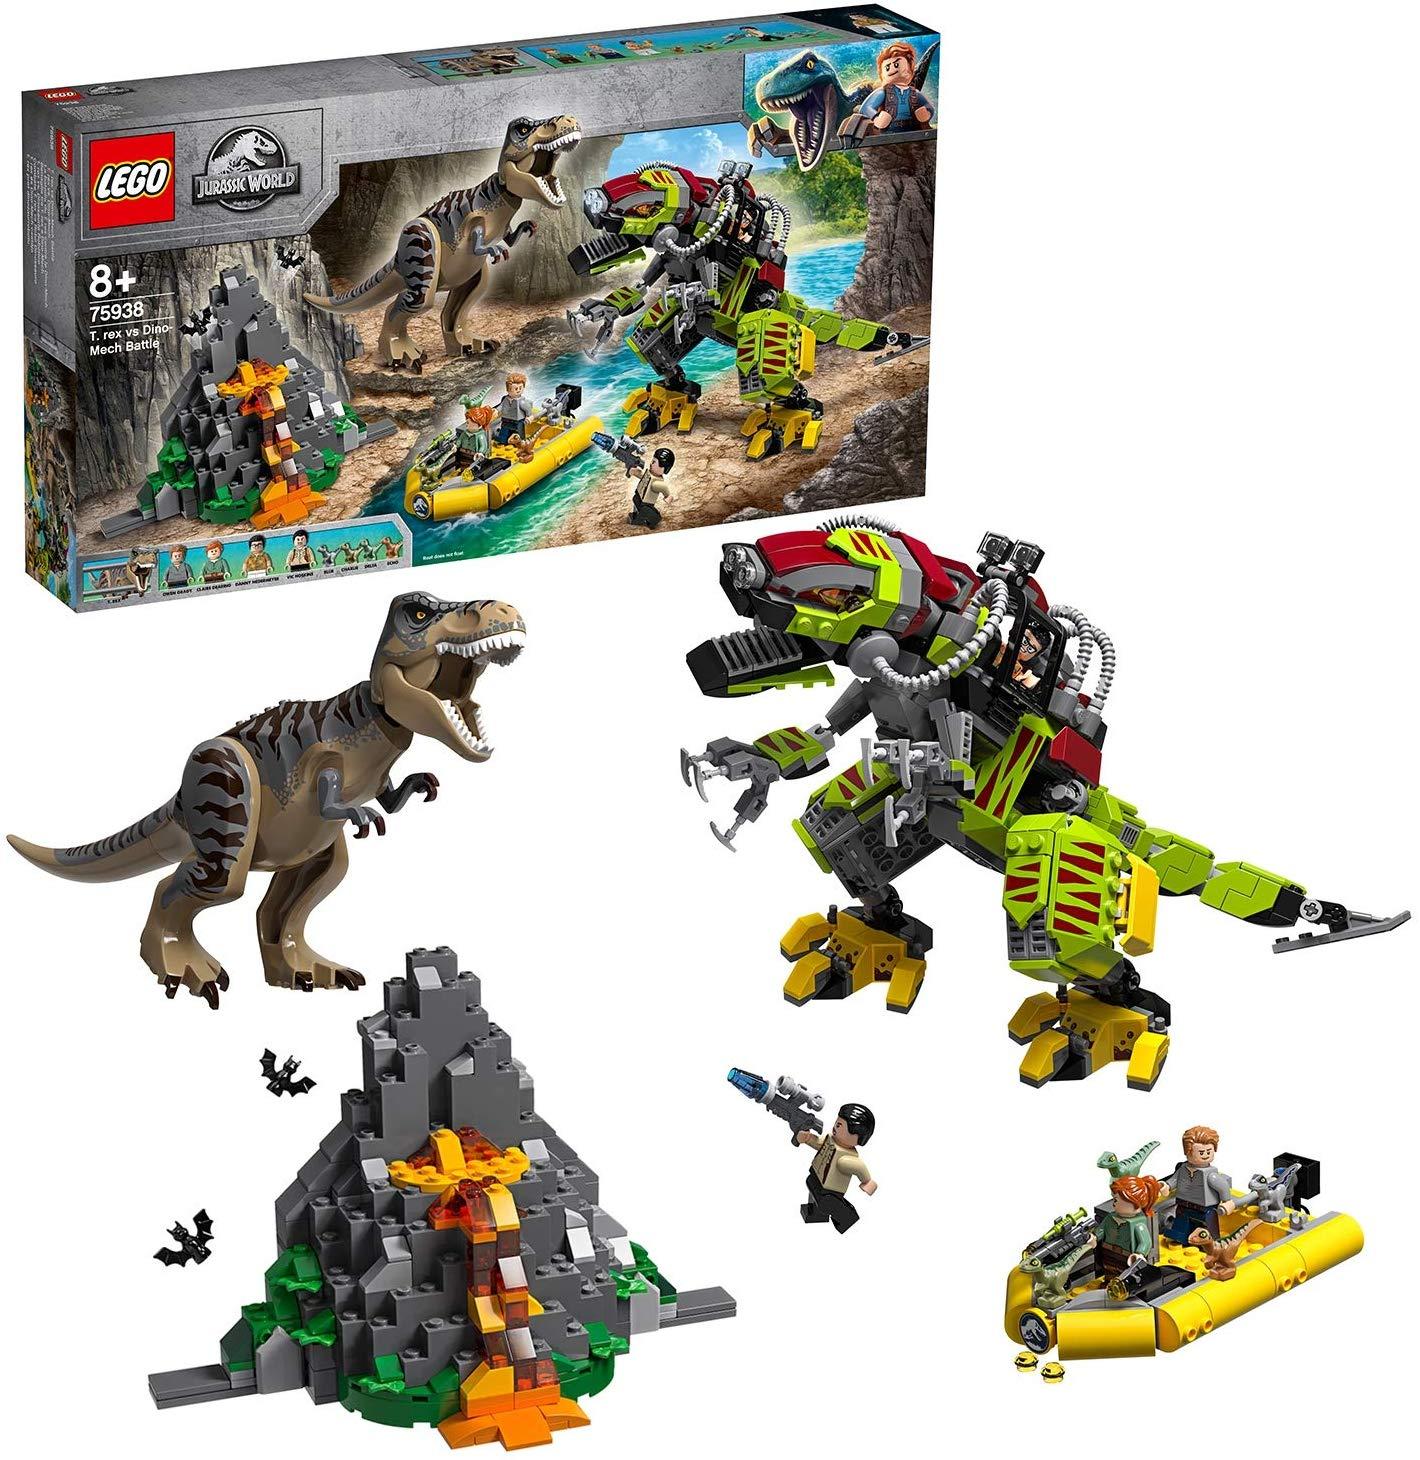 LEGO 75938 Jurassic World T. Rex vs Dino-Mech Battle £66.95 @ Amazon